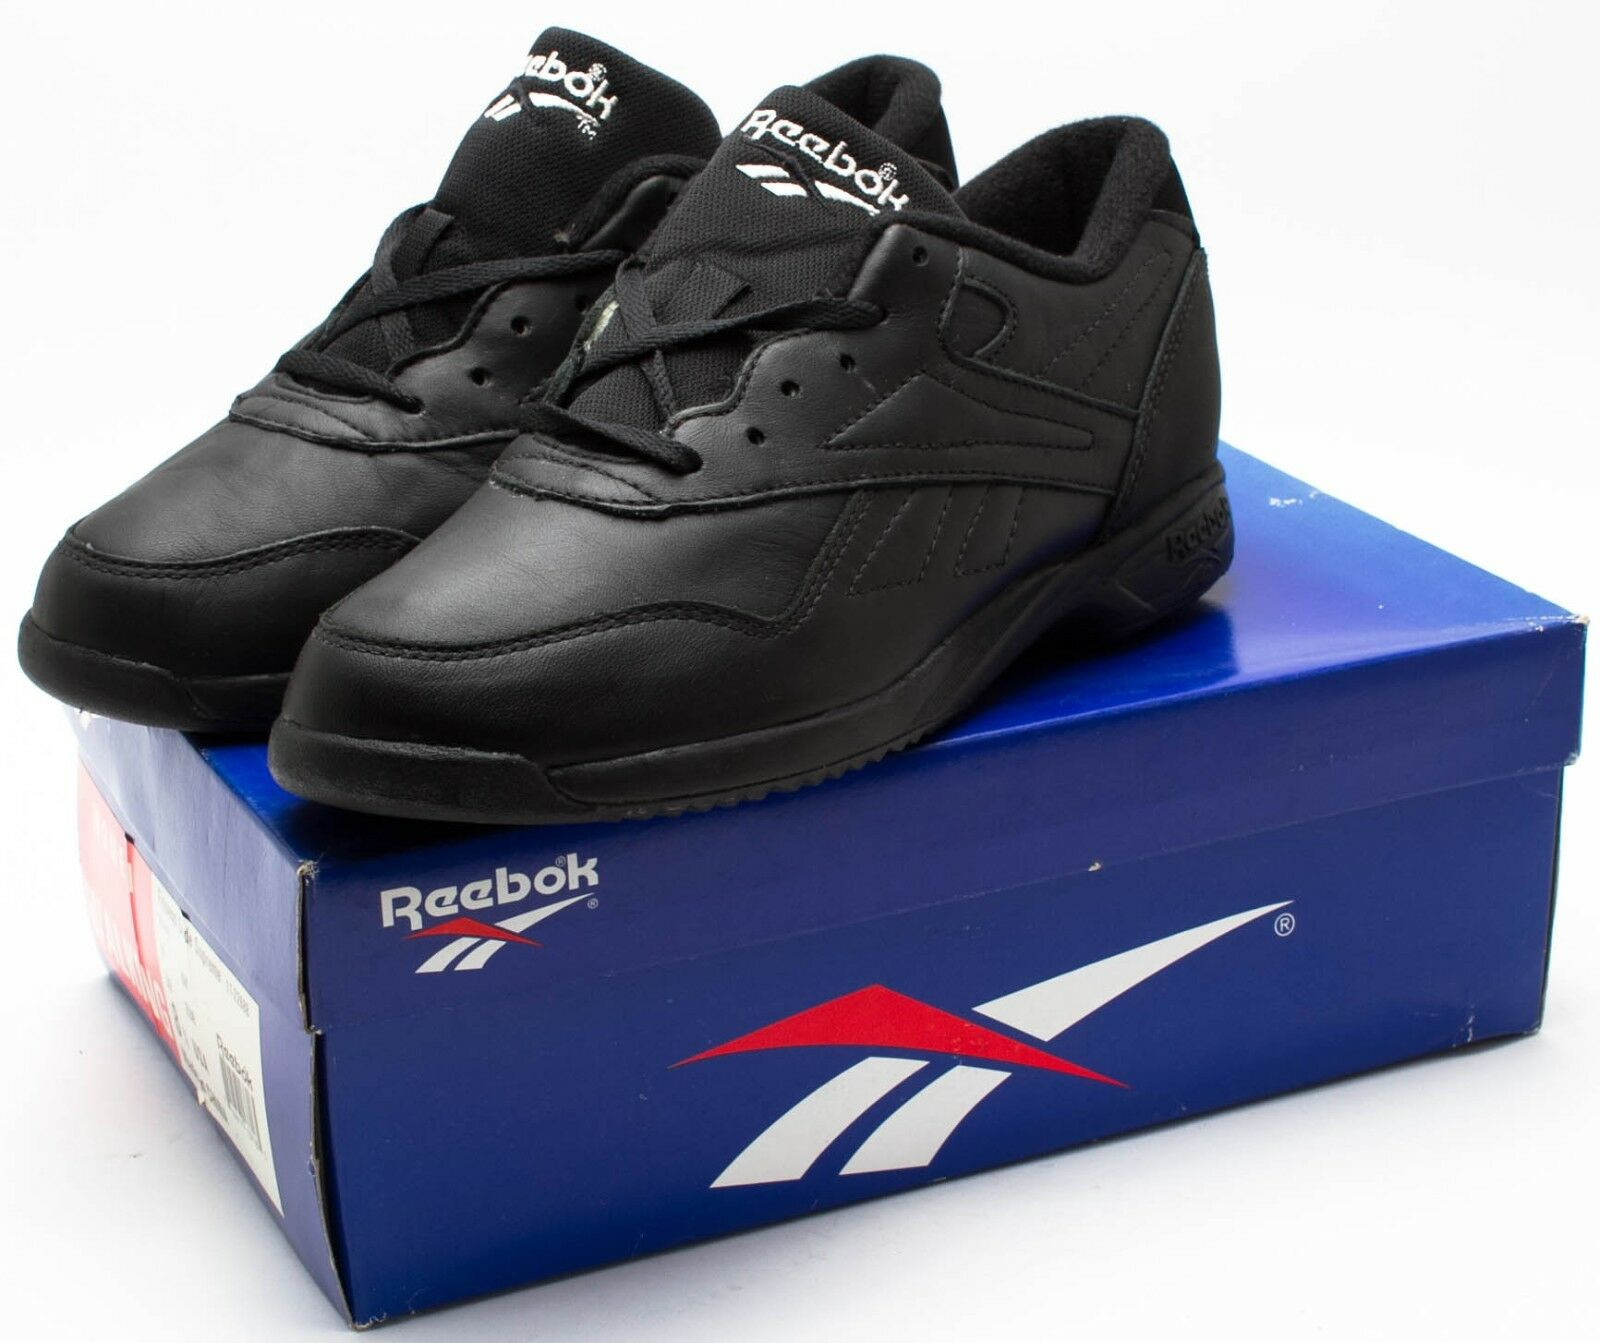 Reebok Damen VINTAGE 1990s OG Fitness Glide Supreme Schuhe 11-22688 weiß sz.8.5